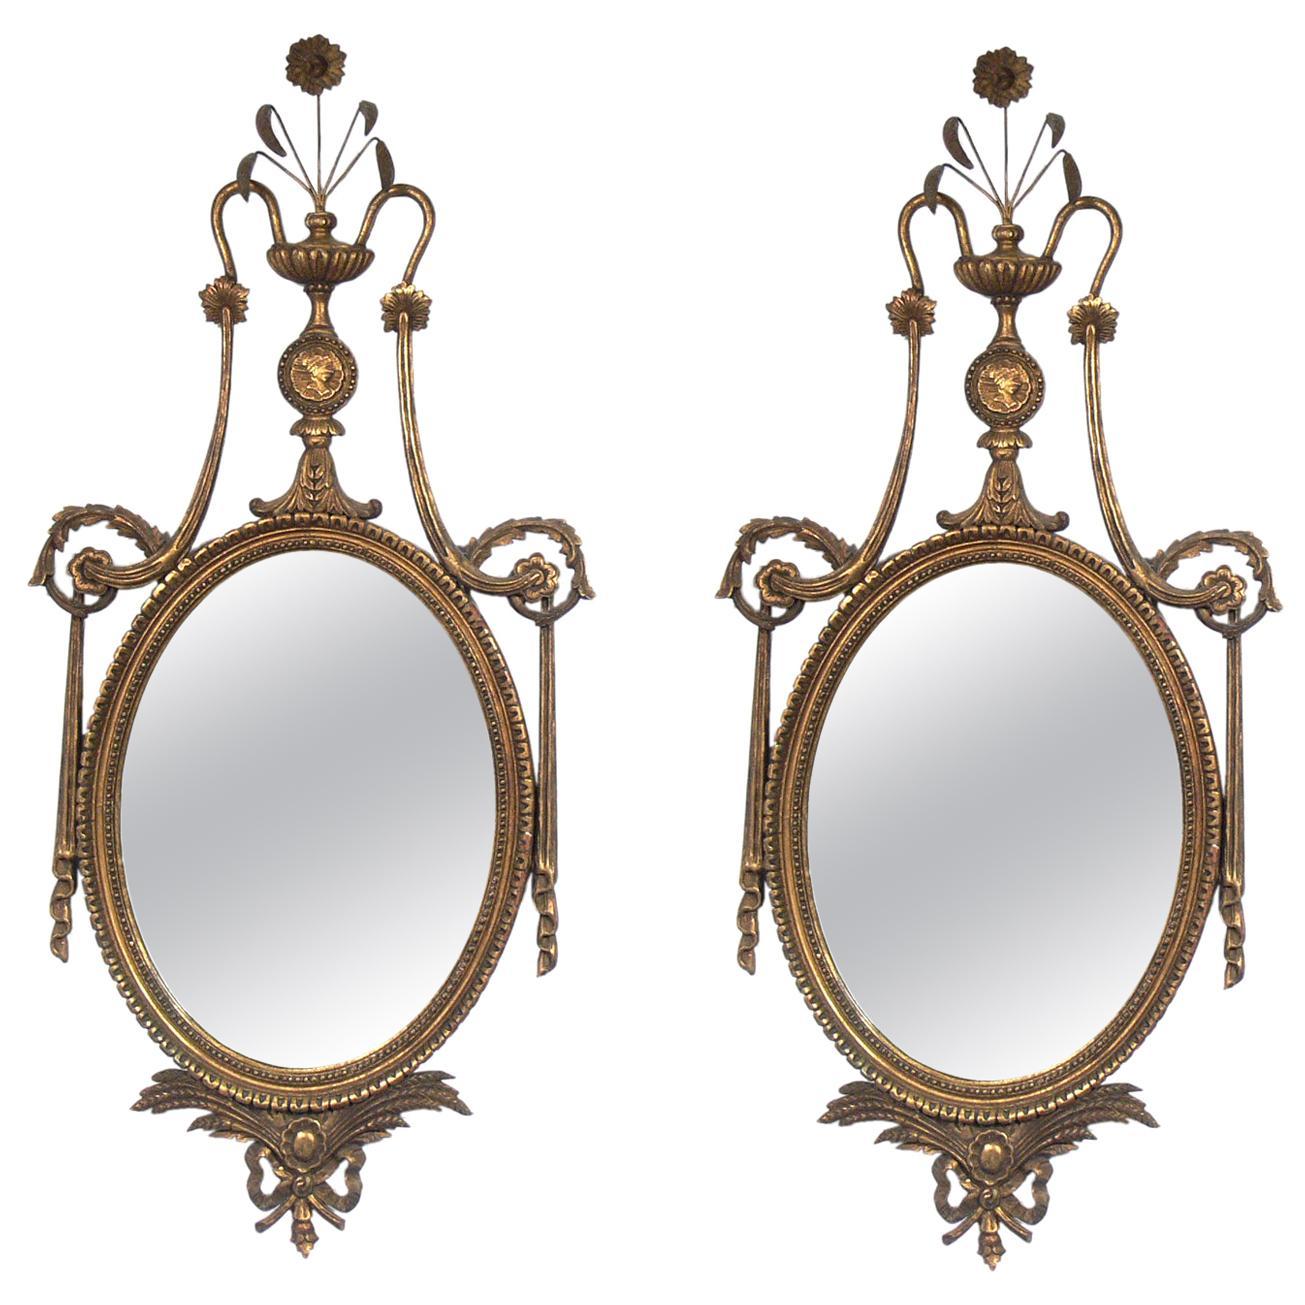 Pair of Ornate 1940s Gilt Mirrors